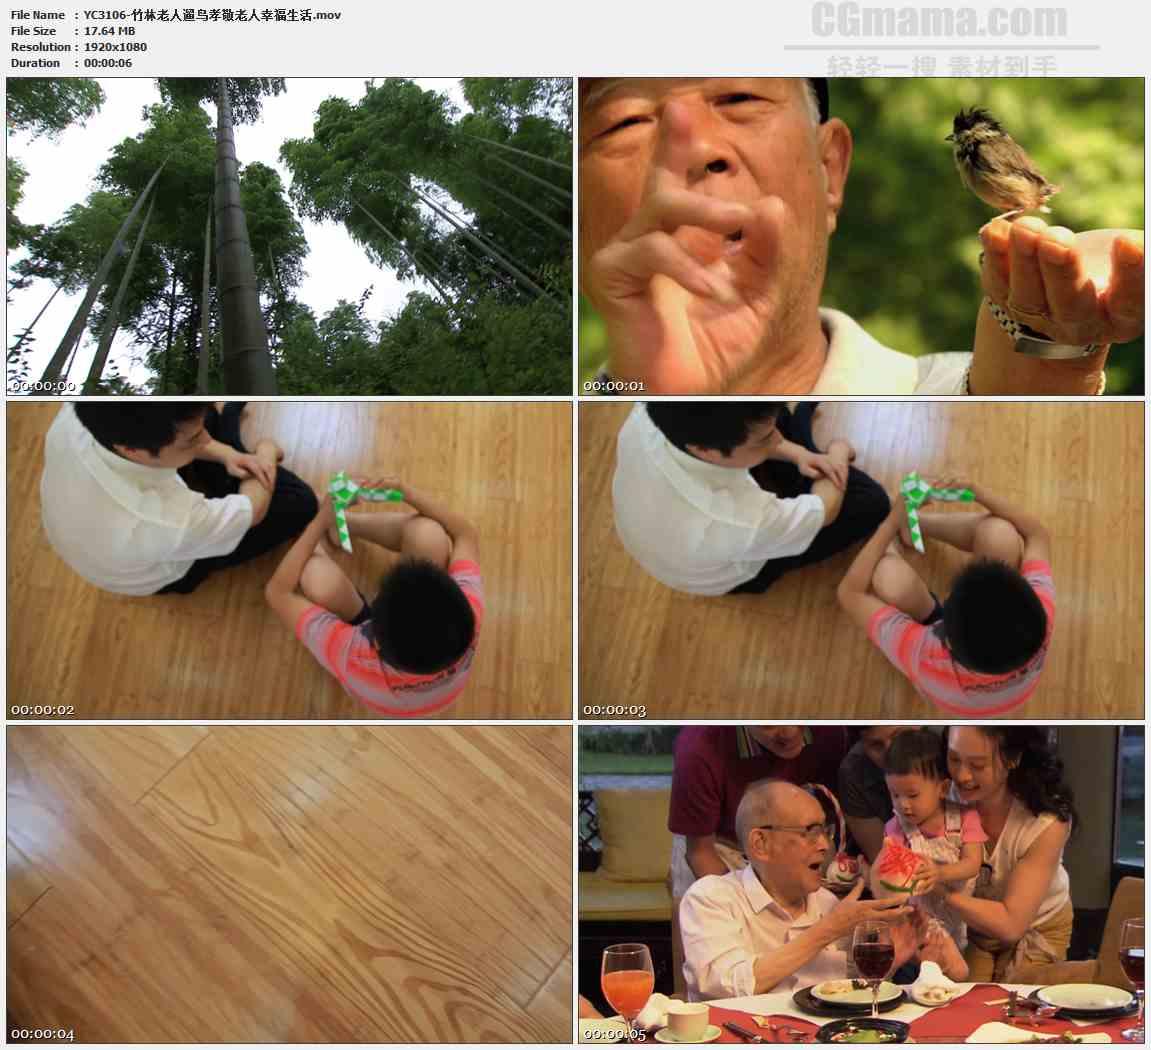 YC3106-竹林老人遛鸟孝敬老人幸福生活高清实拍视频素材